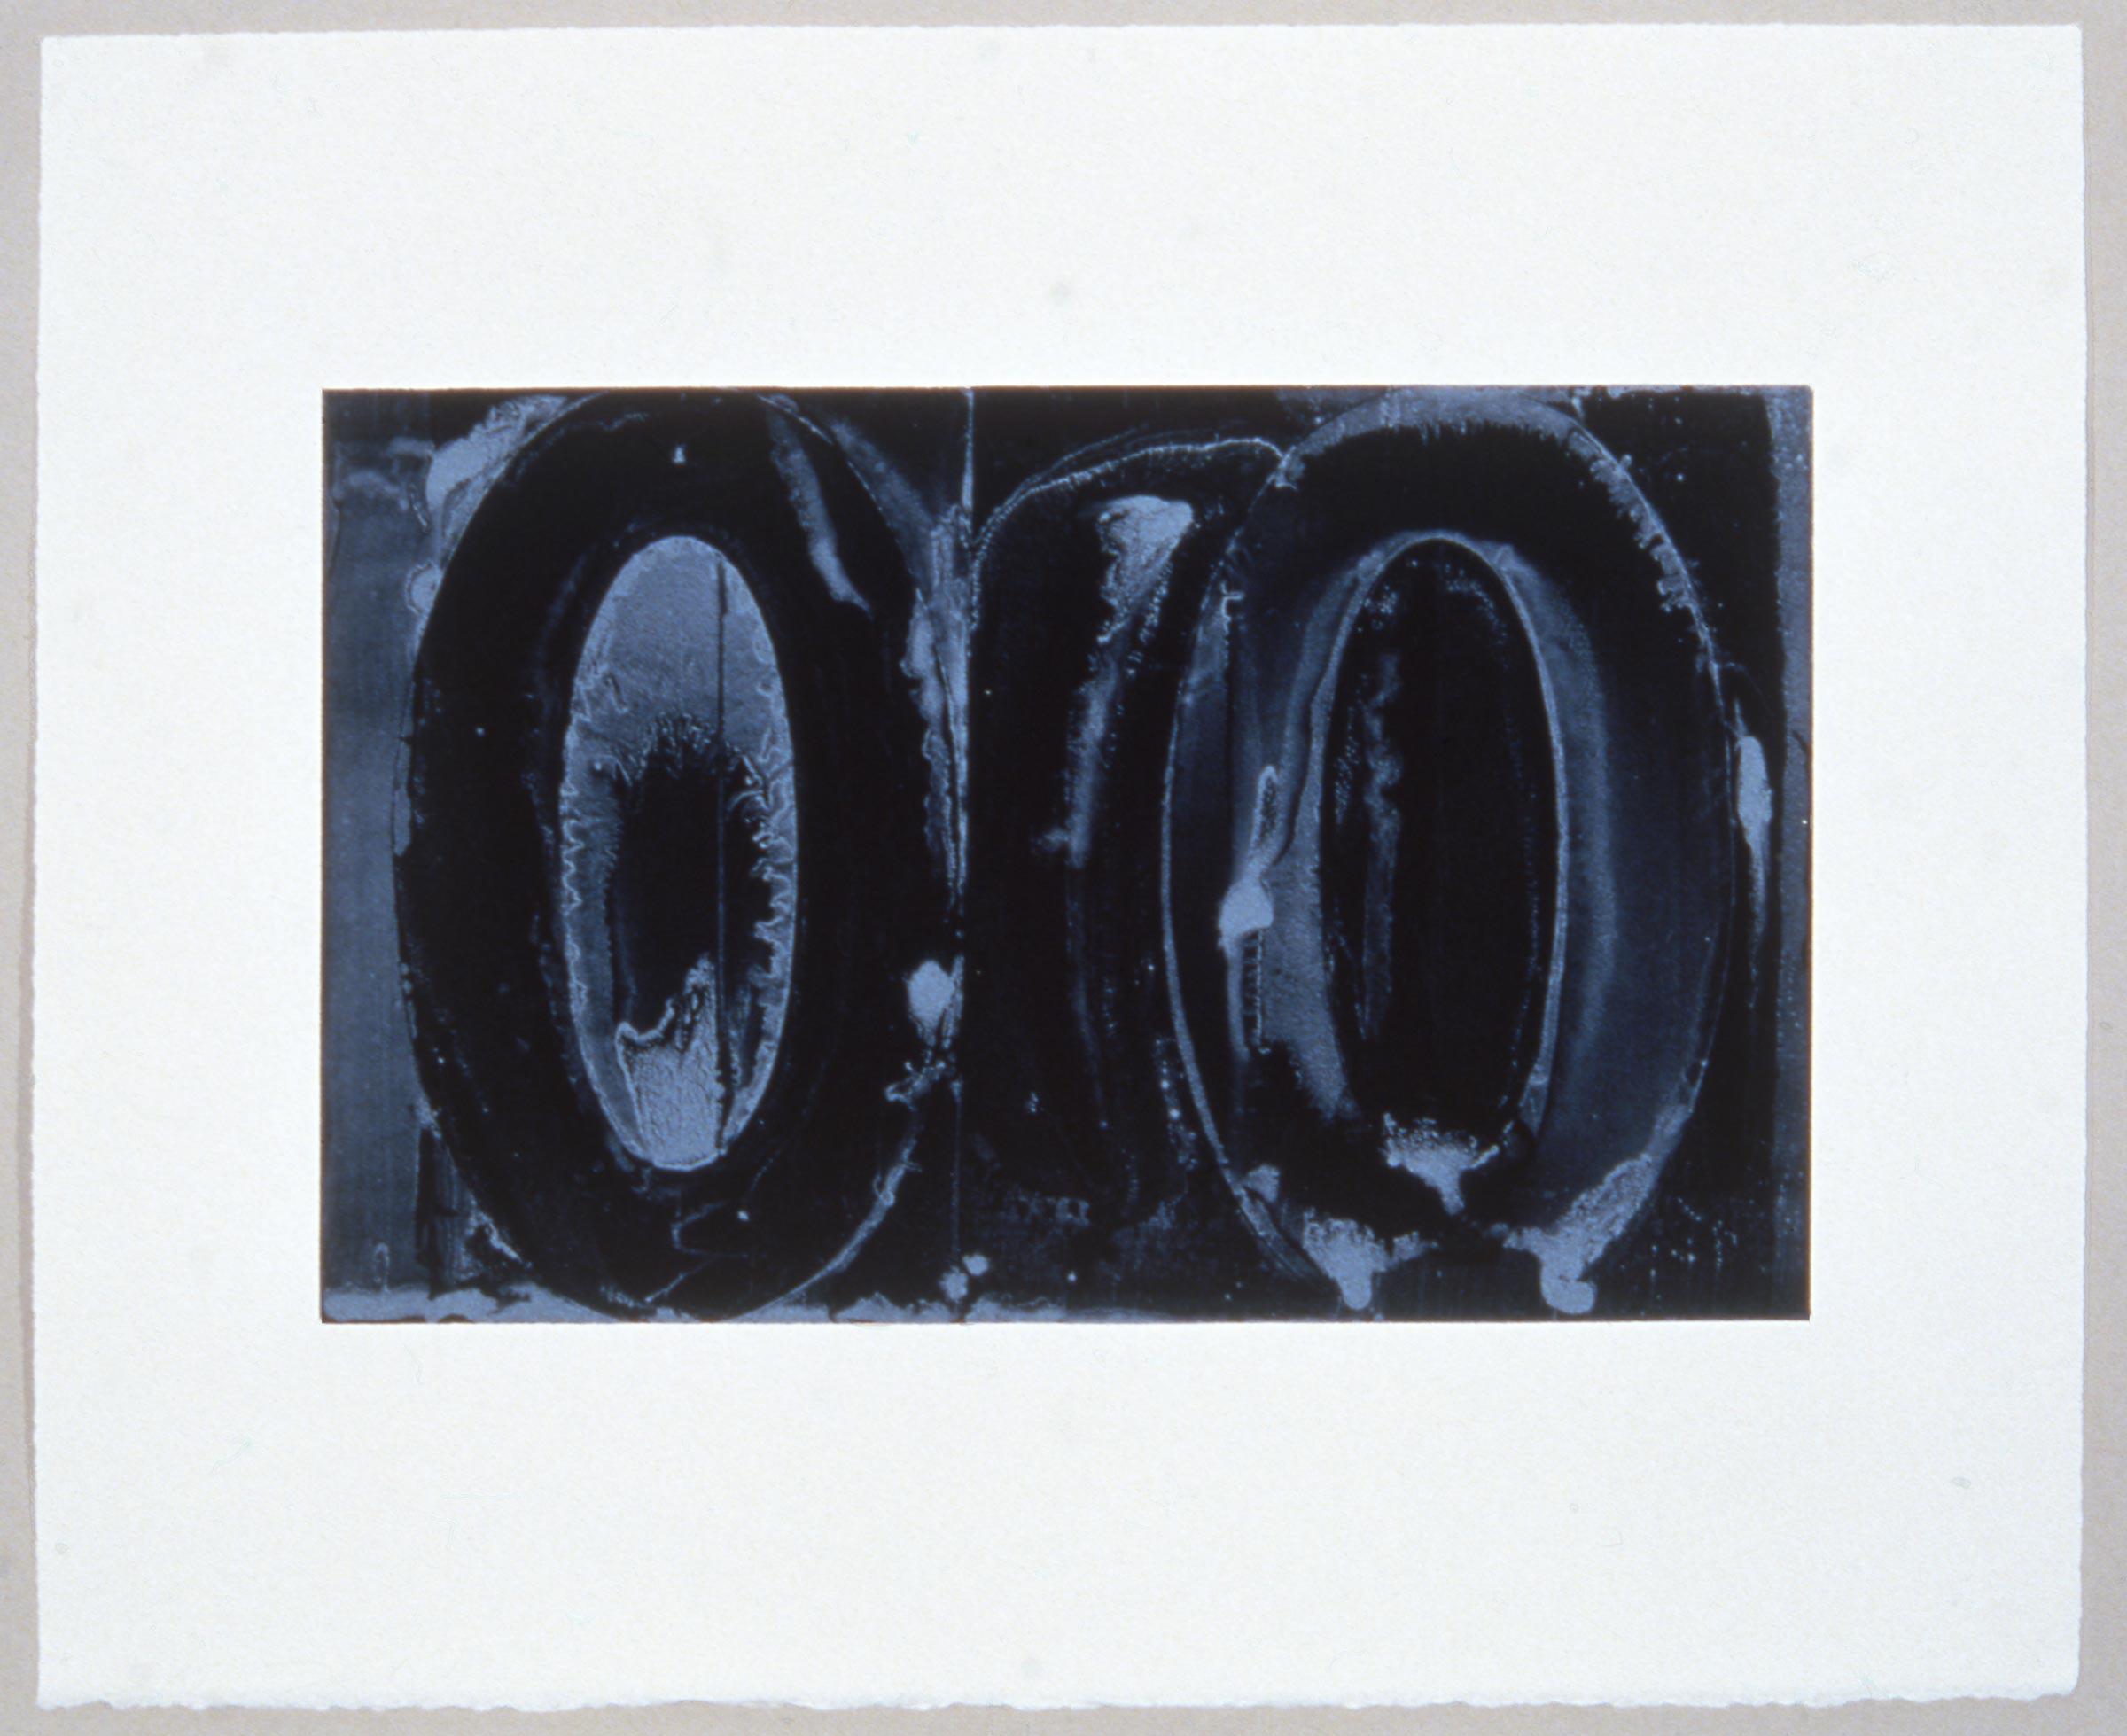 David Row - Ozone Suite I